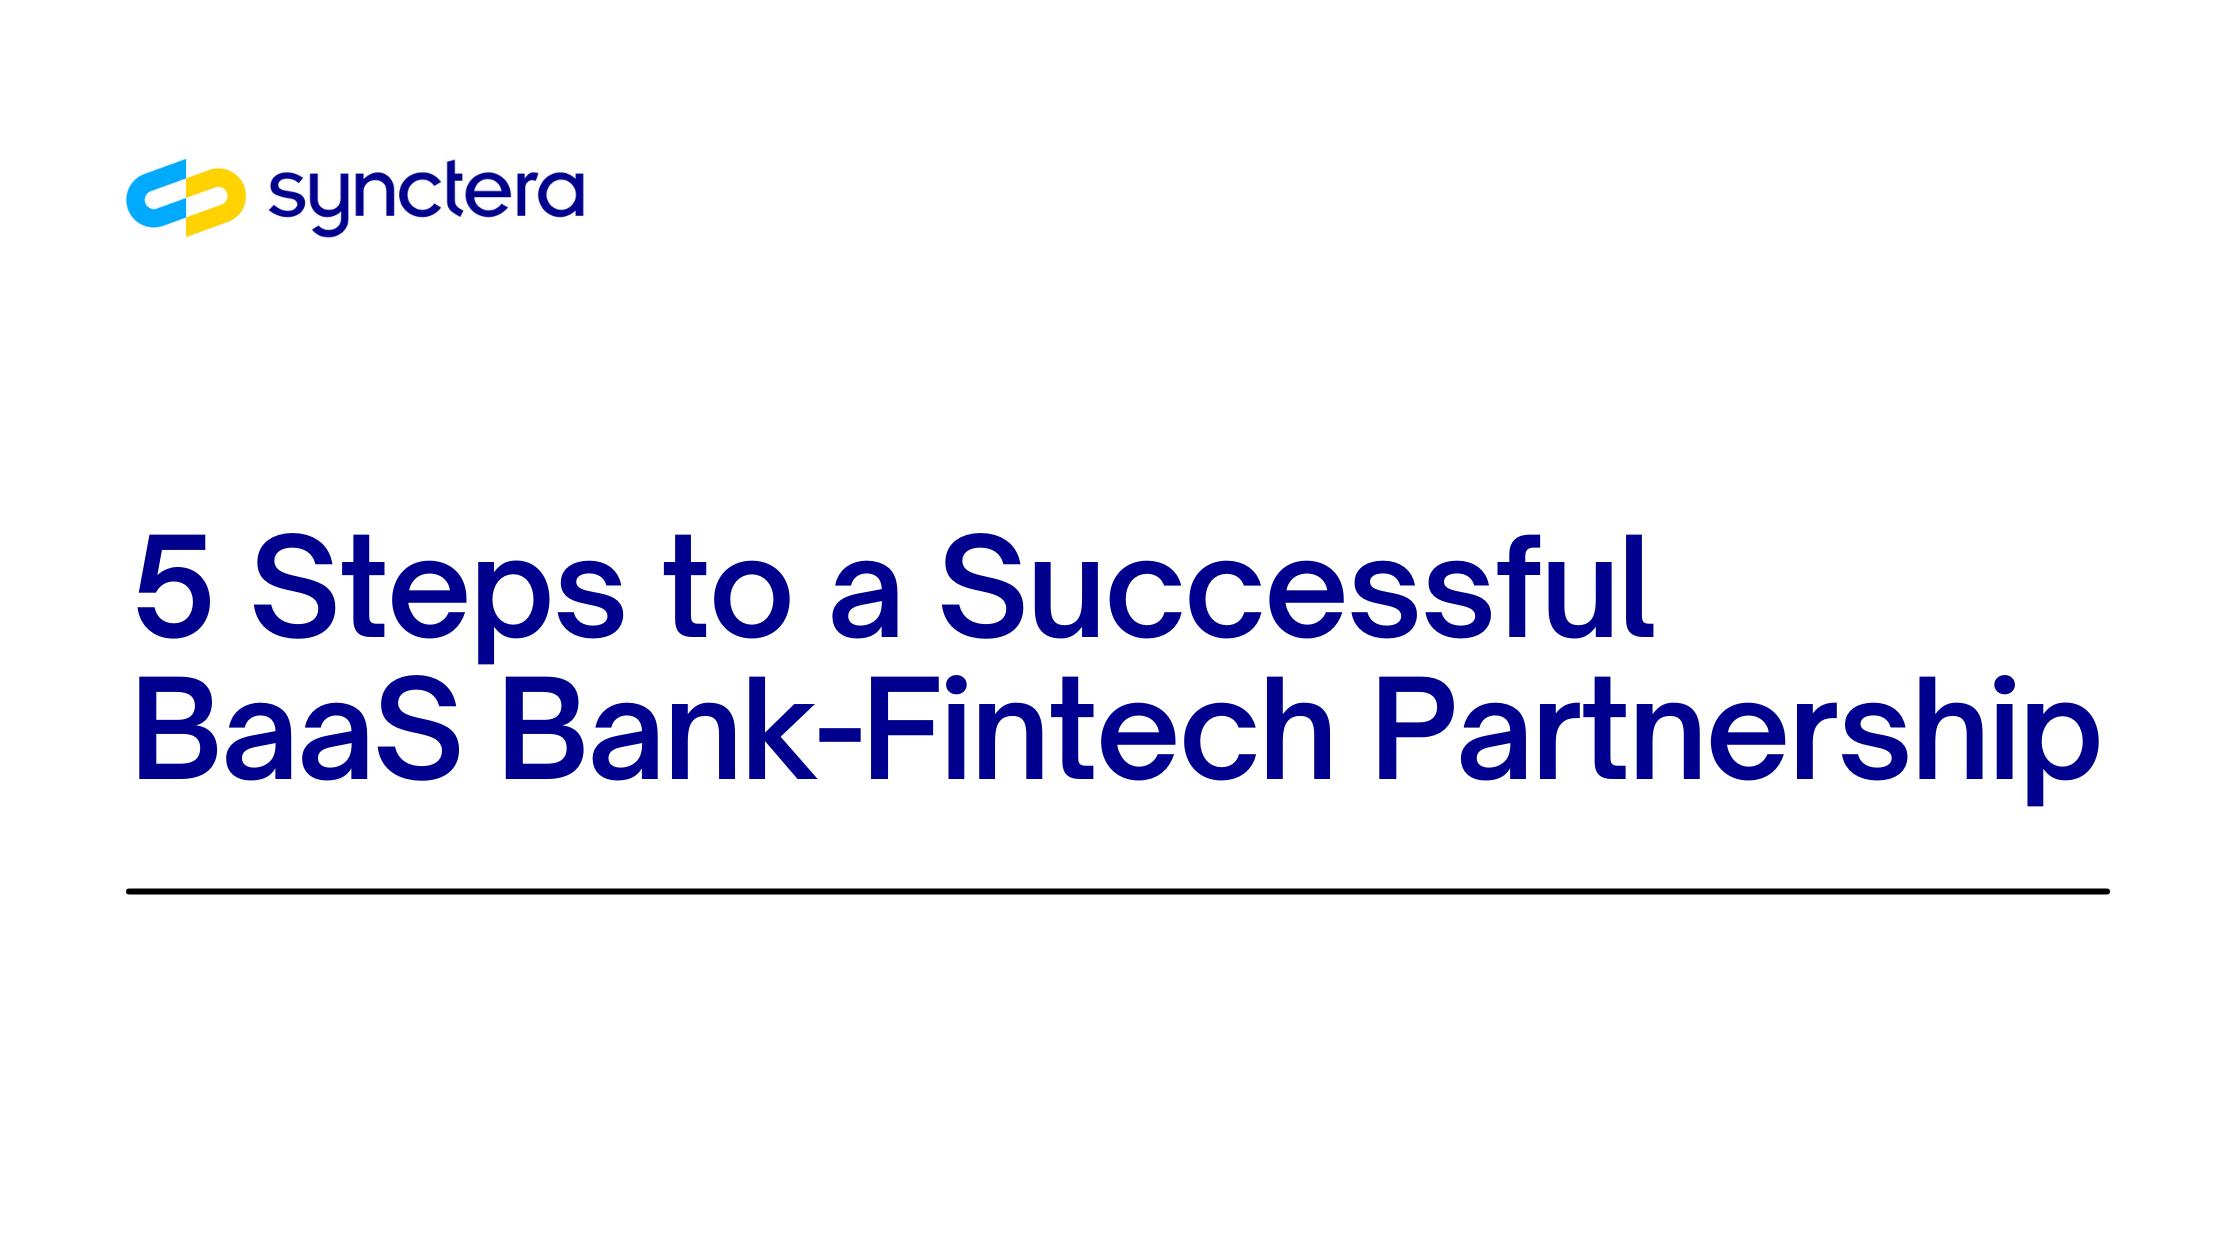 5 Steps to a Successful BaaS Bank-Fintech Partnership